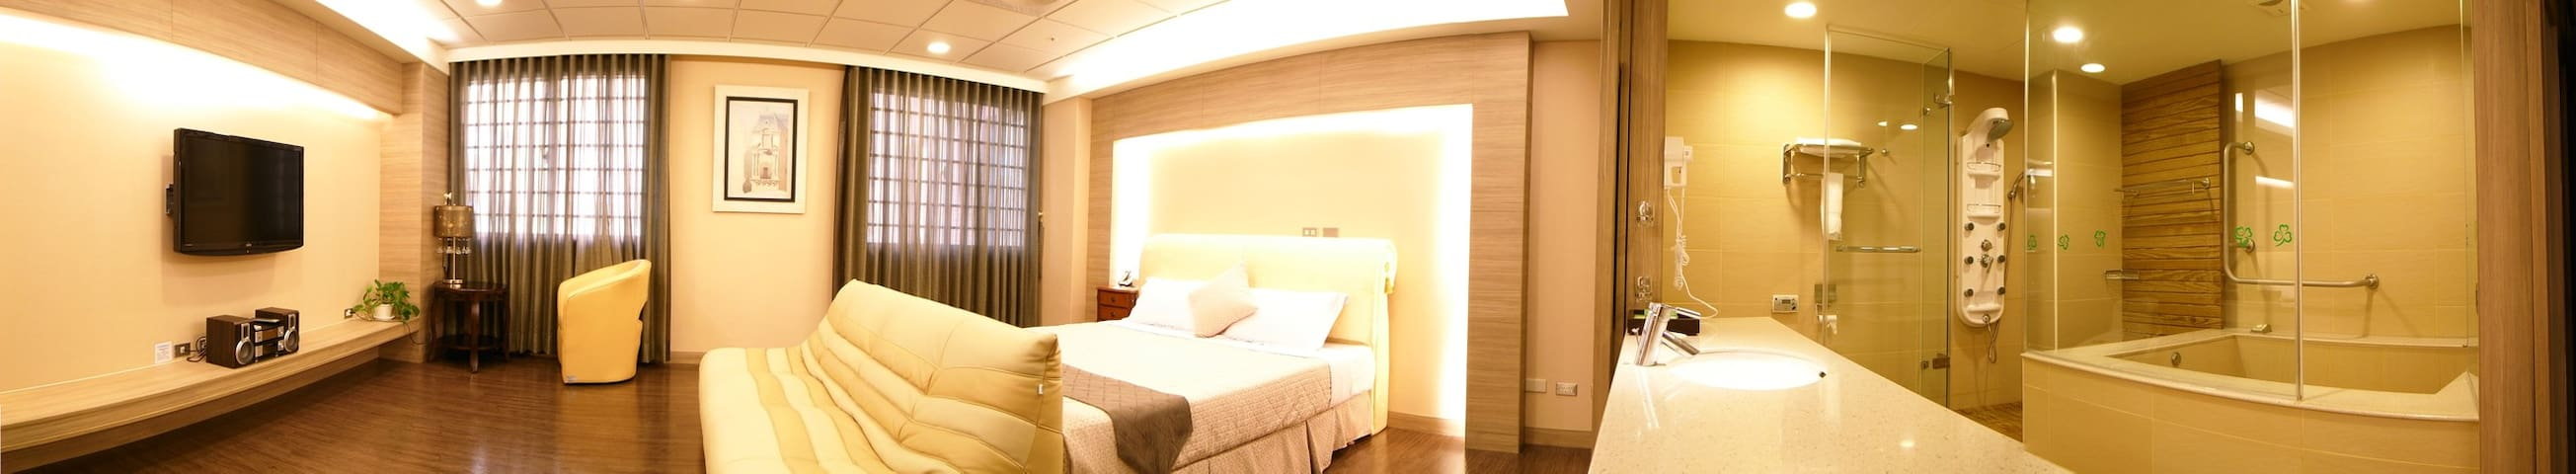 秀傳樂活紓壓俱樂部 - Lukang Township - Guest suite